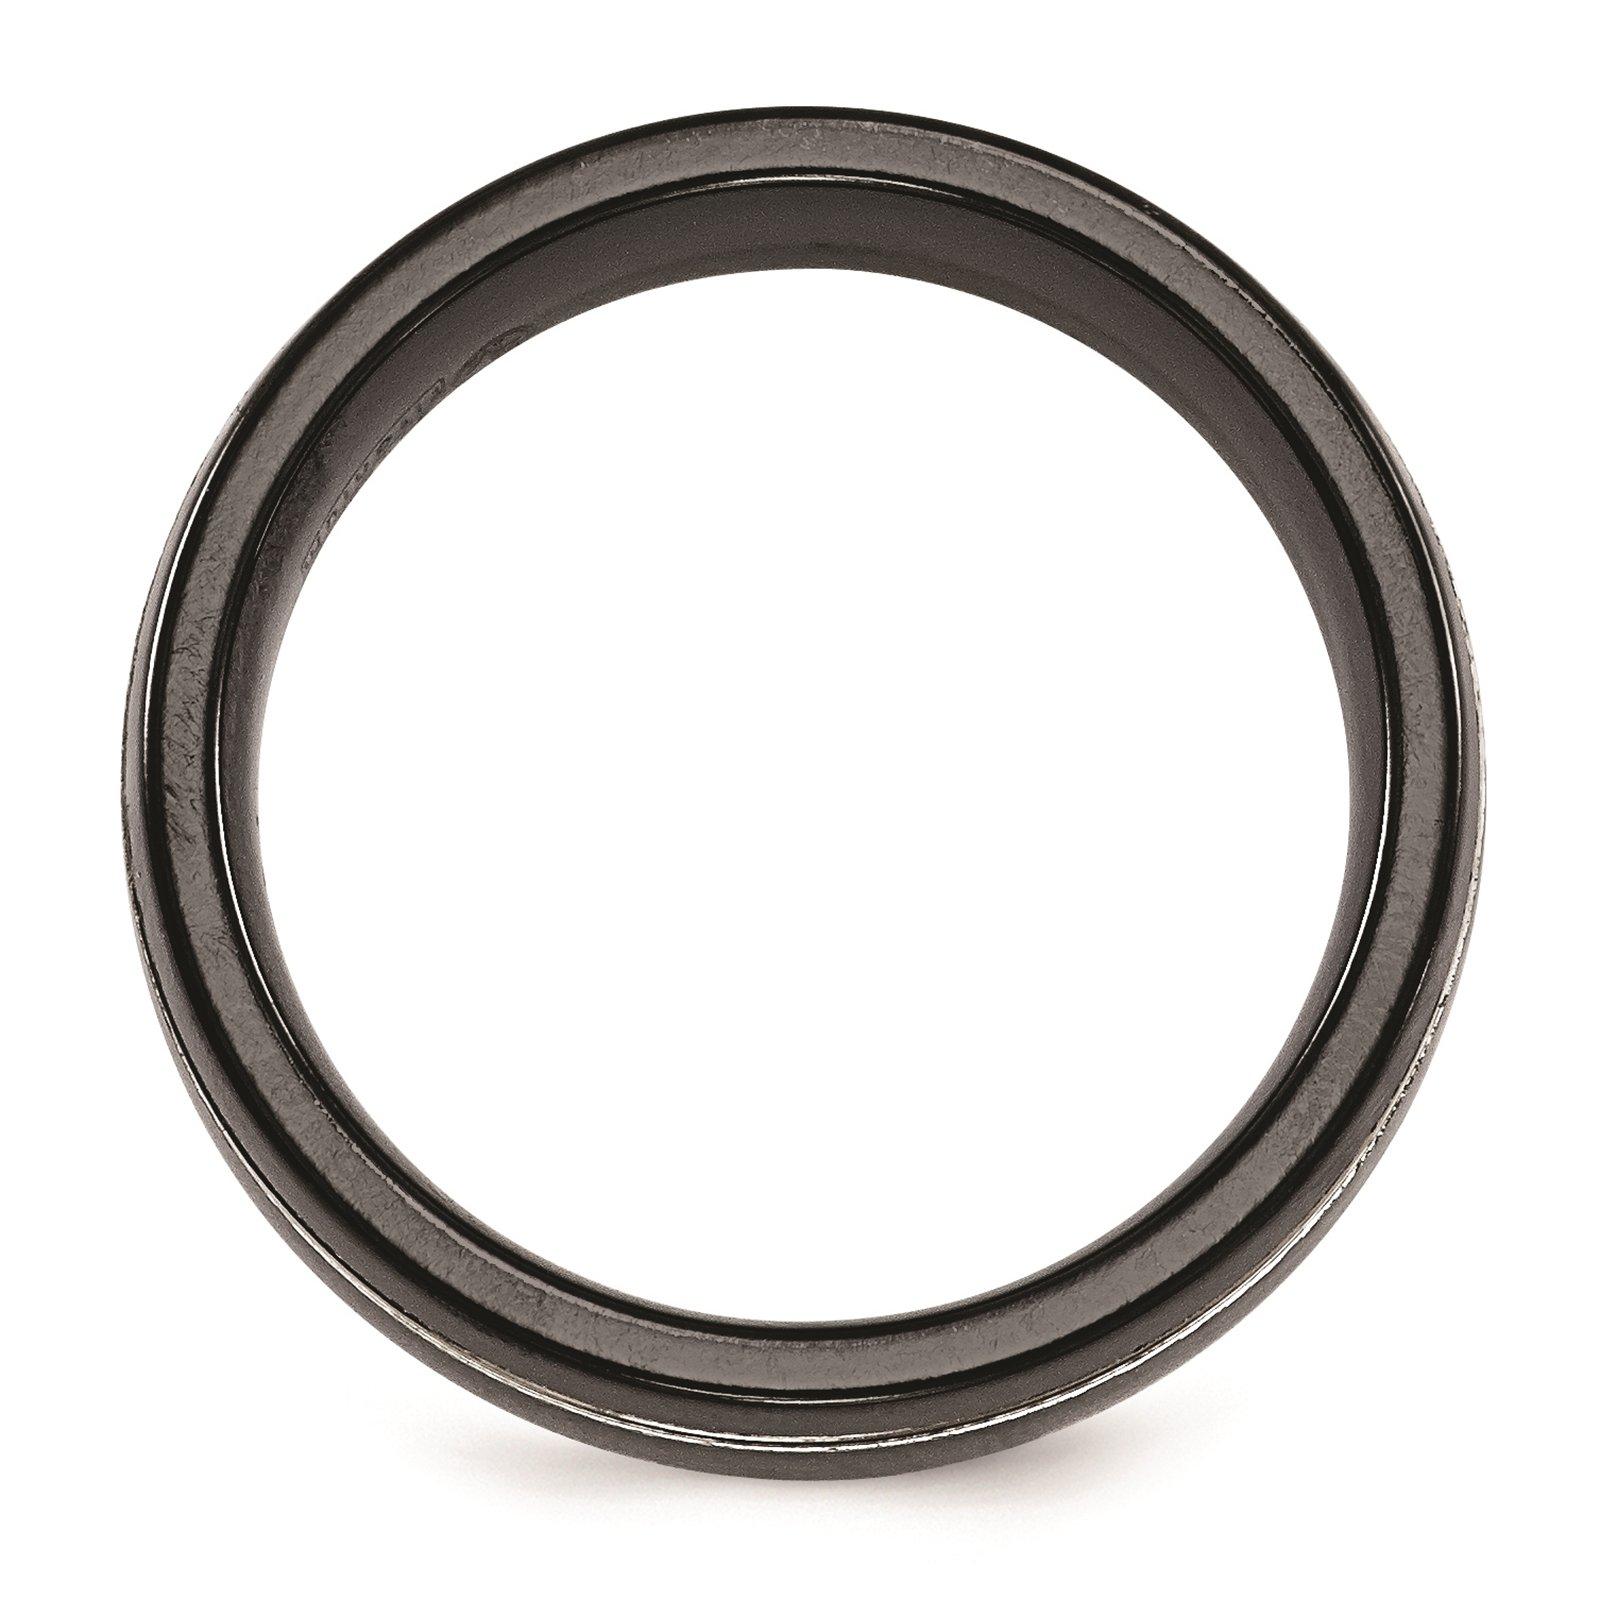 Titanium Black Ti & Grey Grooved 7mm Wedding Ring Band Size 8.5 by Edward Mirell by Venture Edward Mirell Titanium Bands (Image #2)